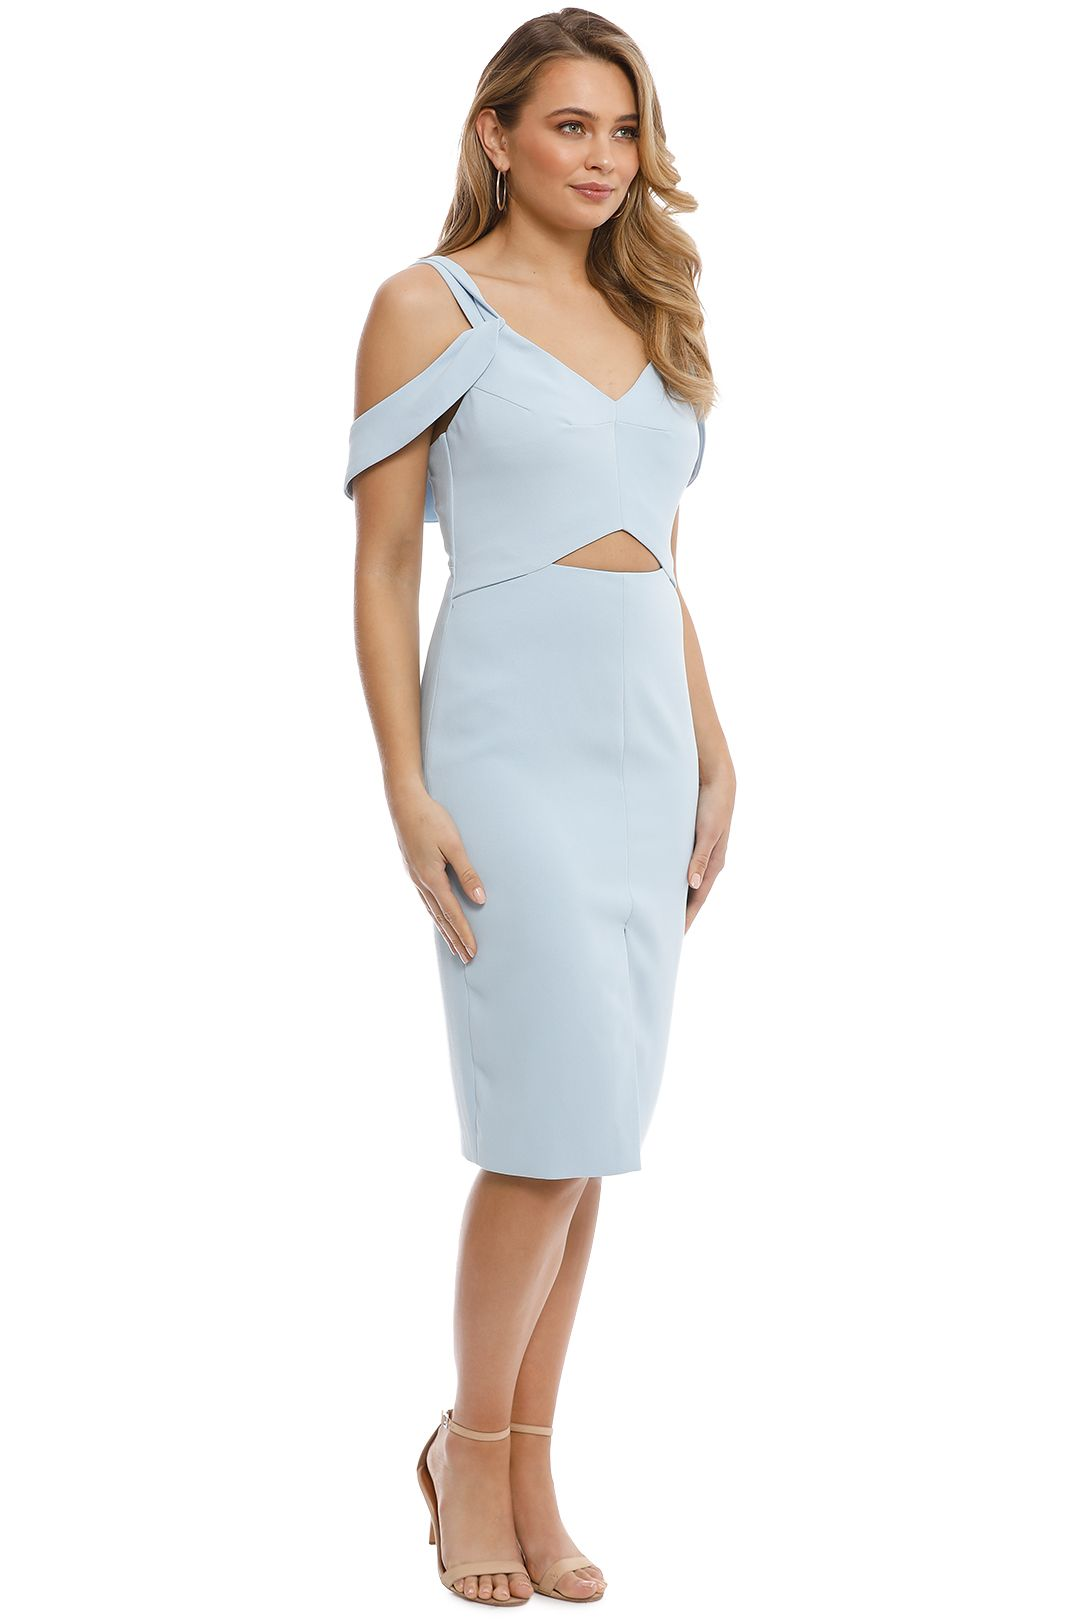 Elliatt - Liberty Dress - Blue - Side